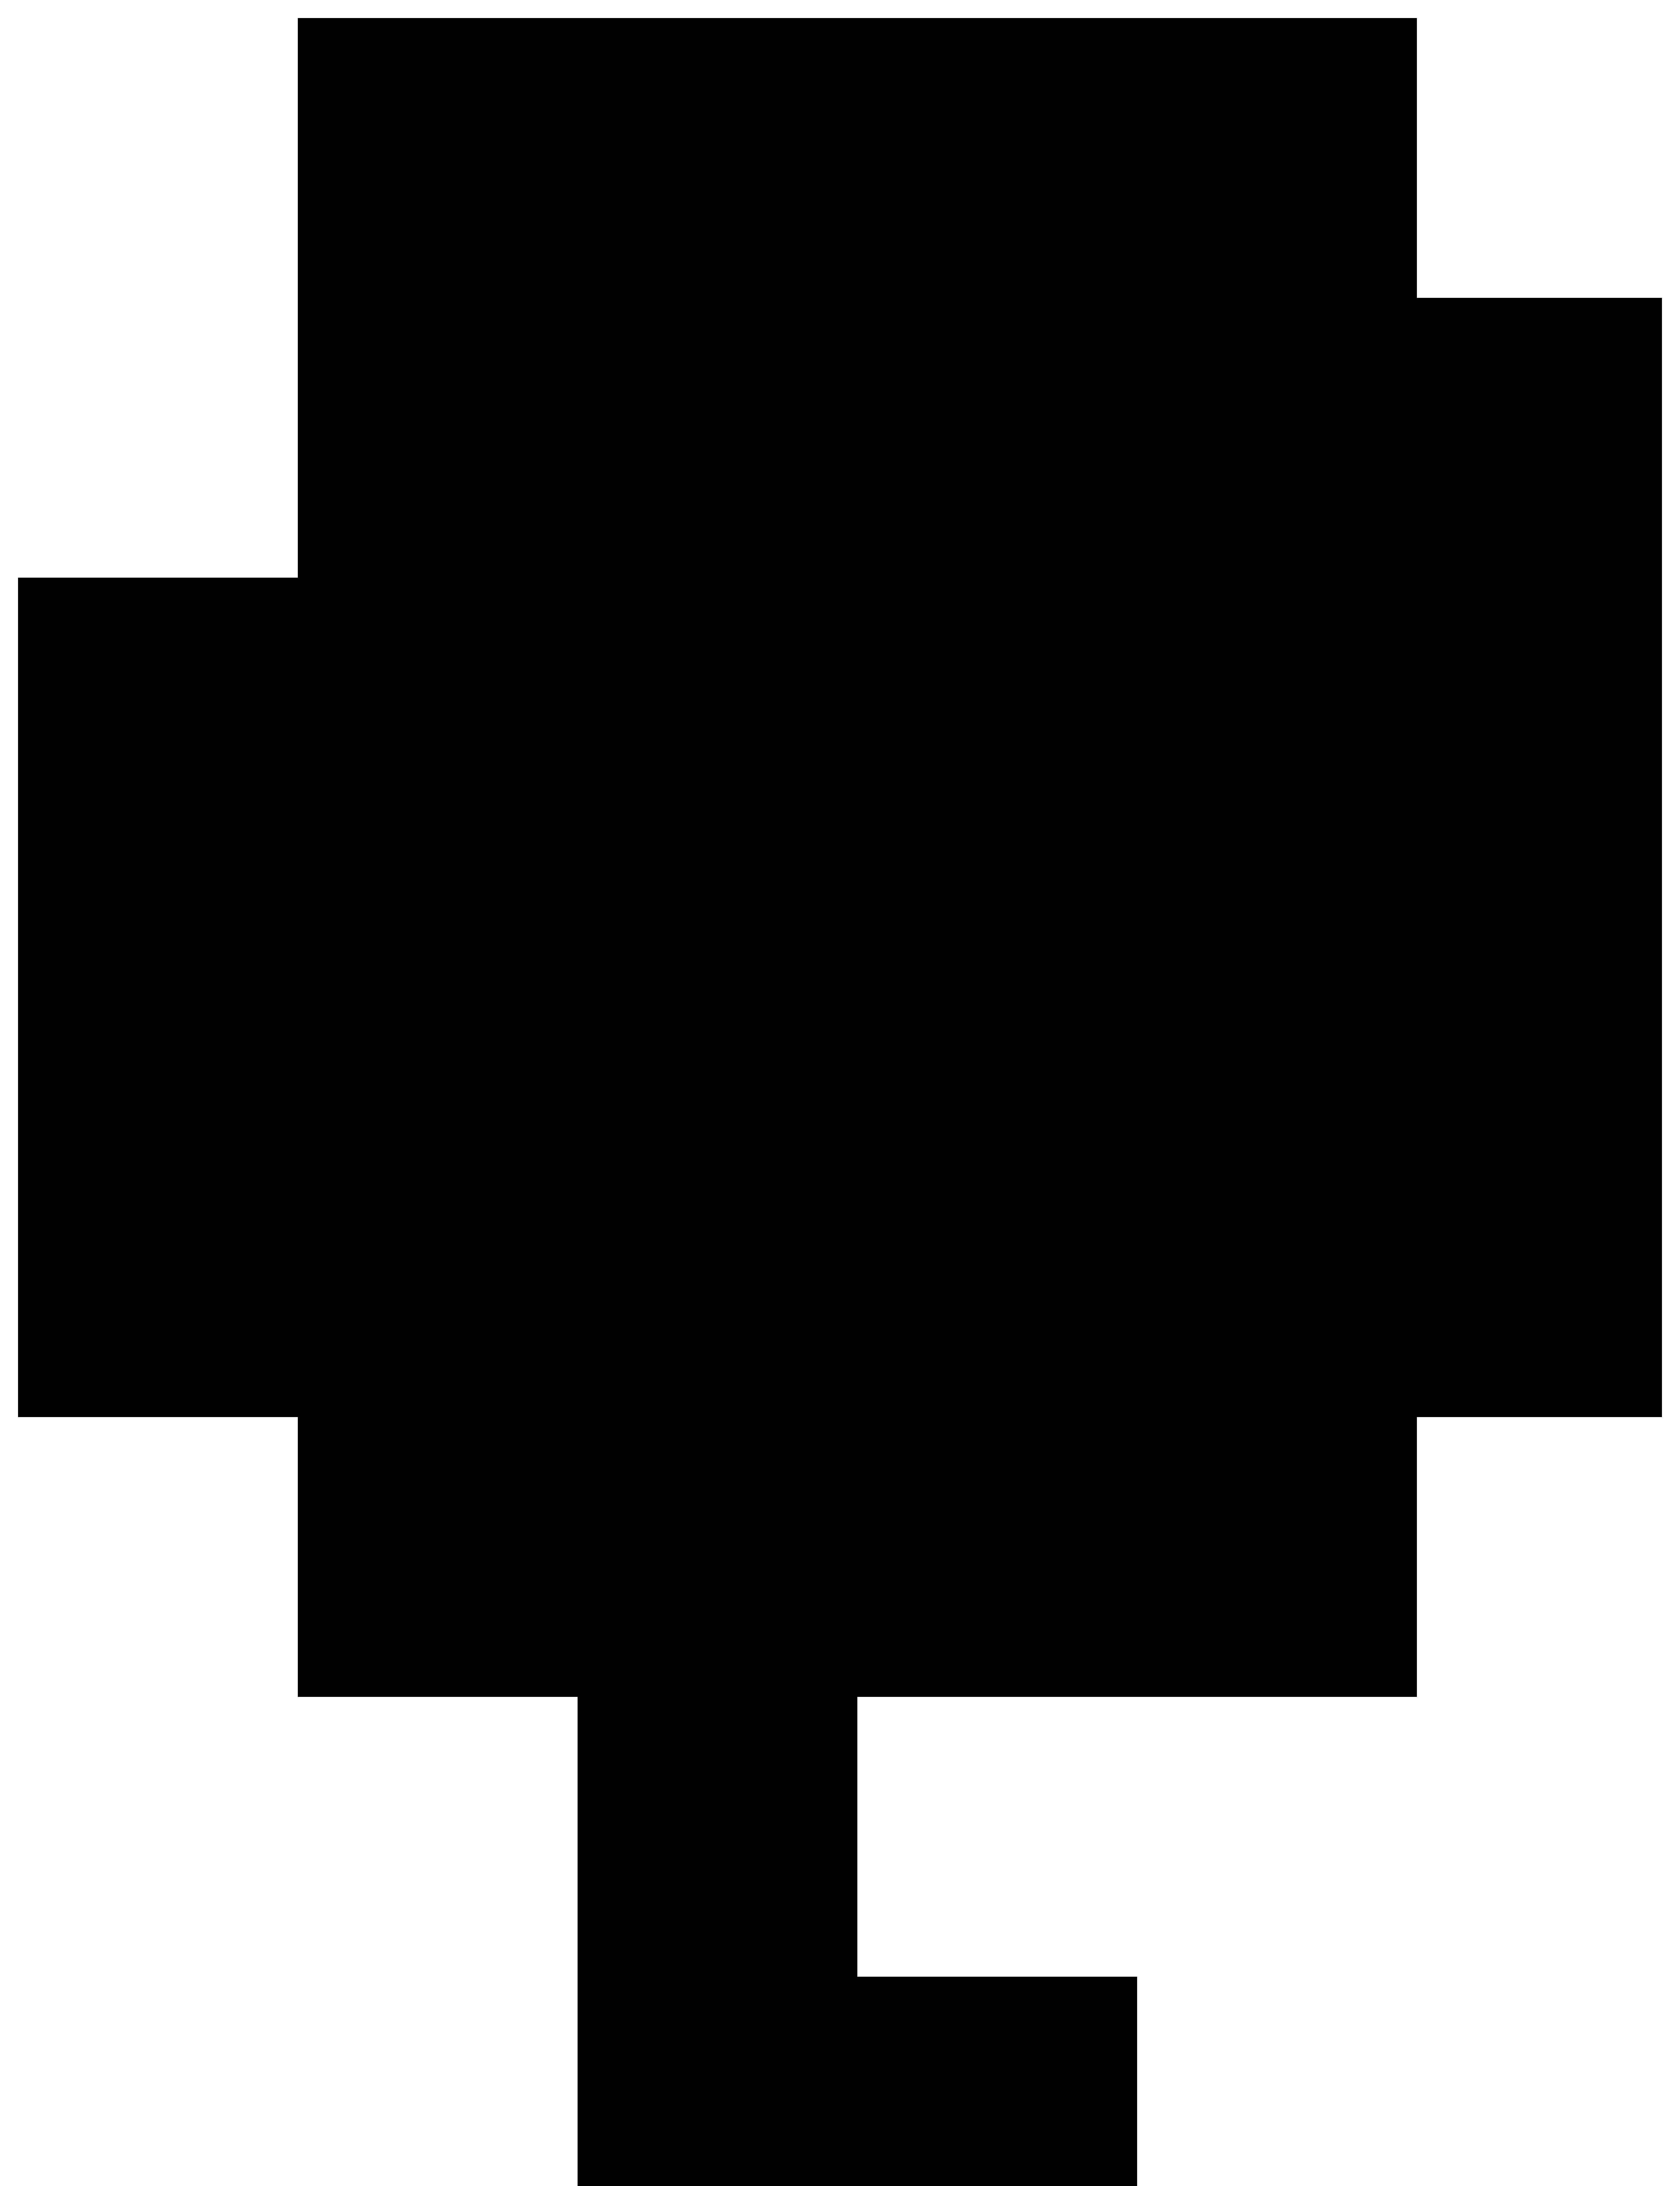 Dead Tree Silhouette PNG Clip Art.